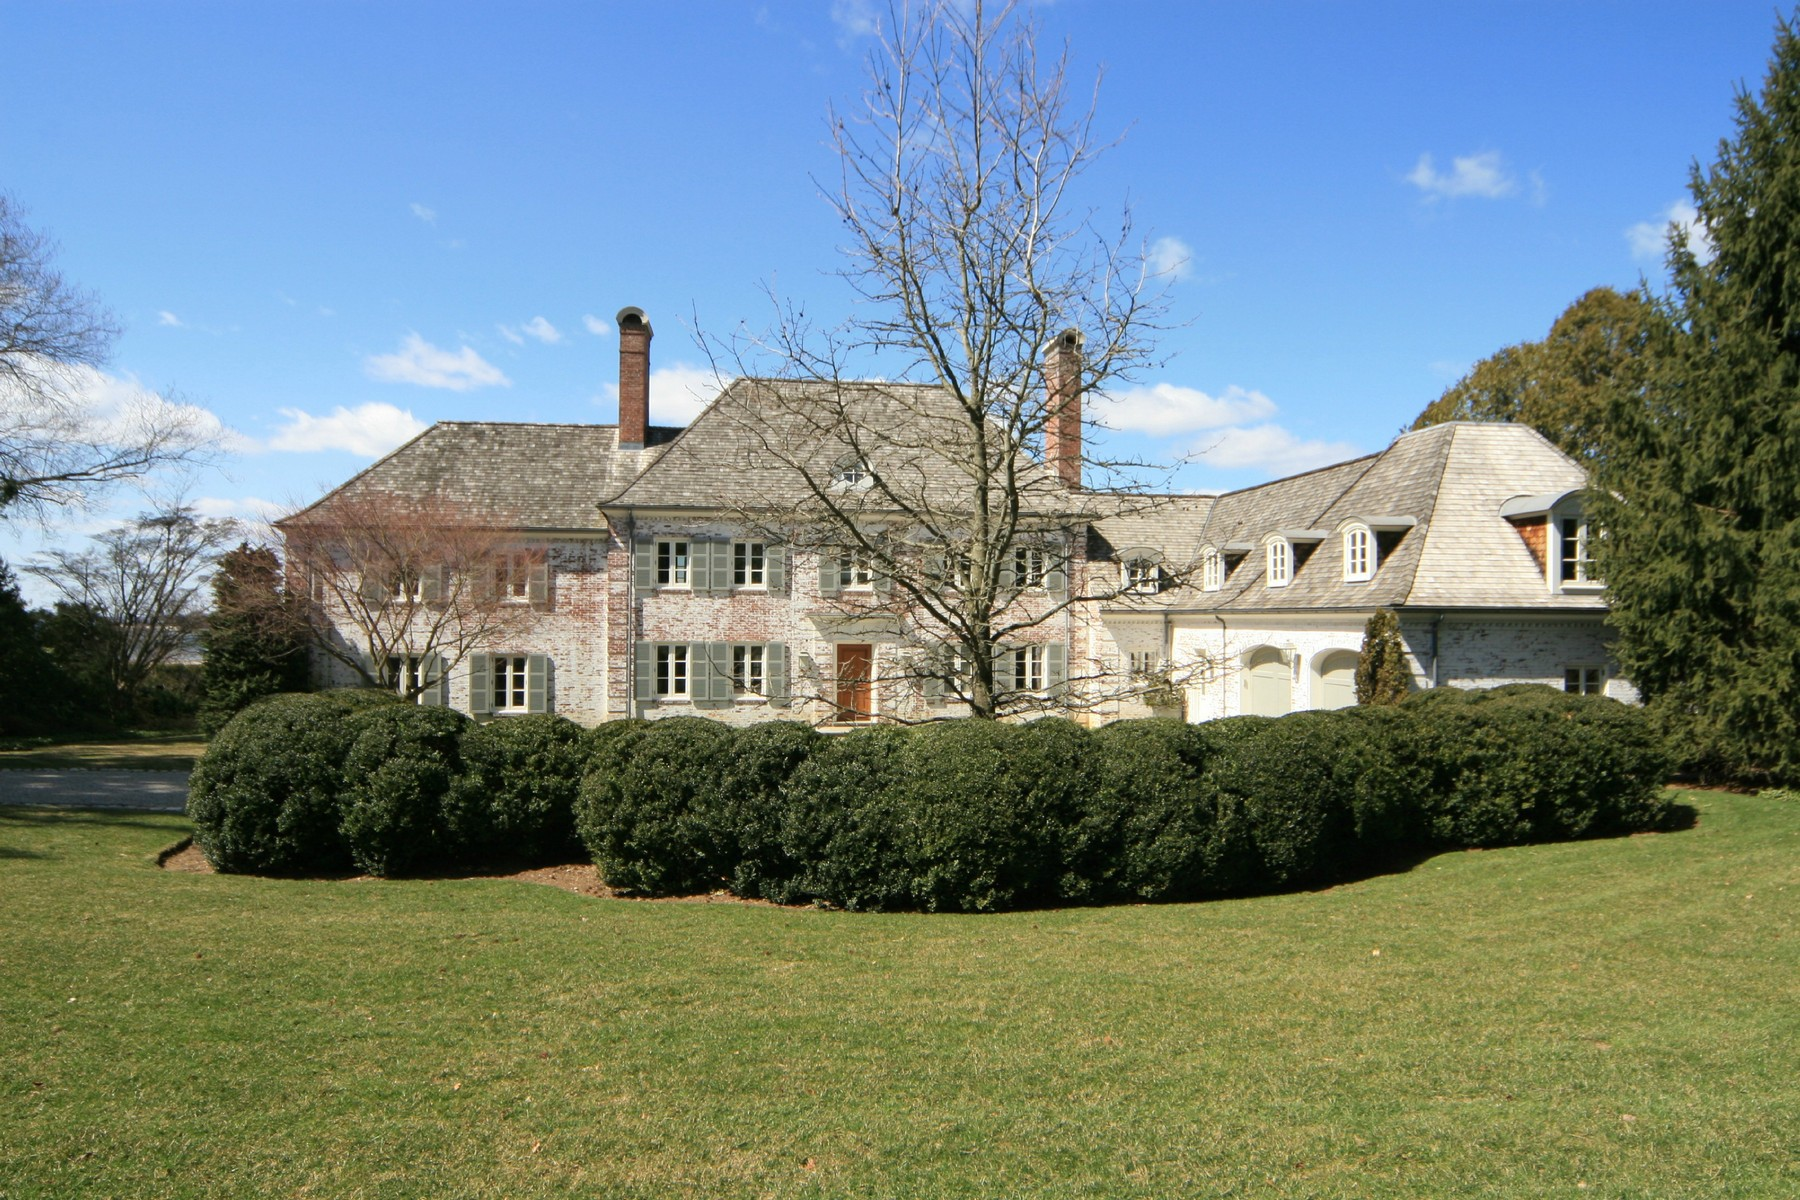 Single Family Home for Sale at LA LANTERNE ON SASCO HILL 794 Sasco Hill Road Fairfield, Connecticut 06824 United States